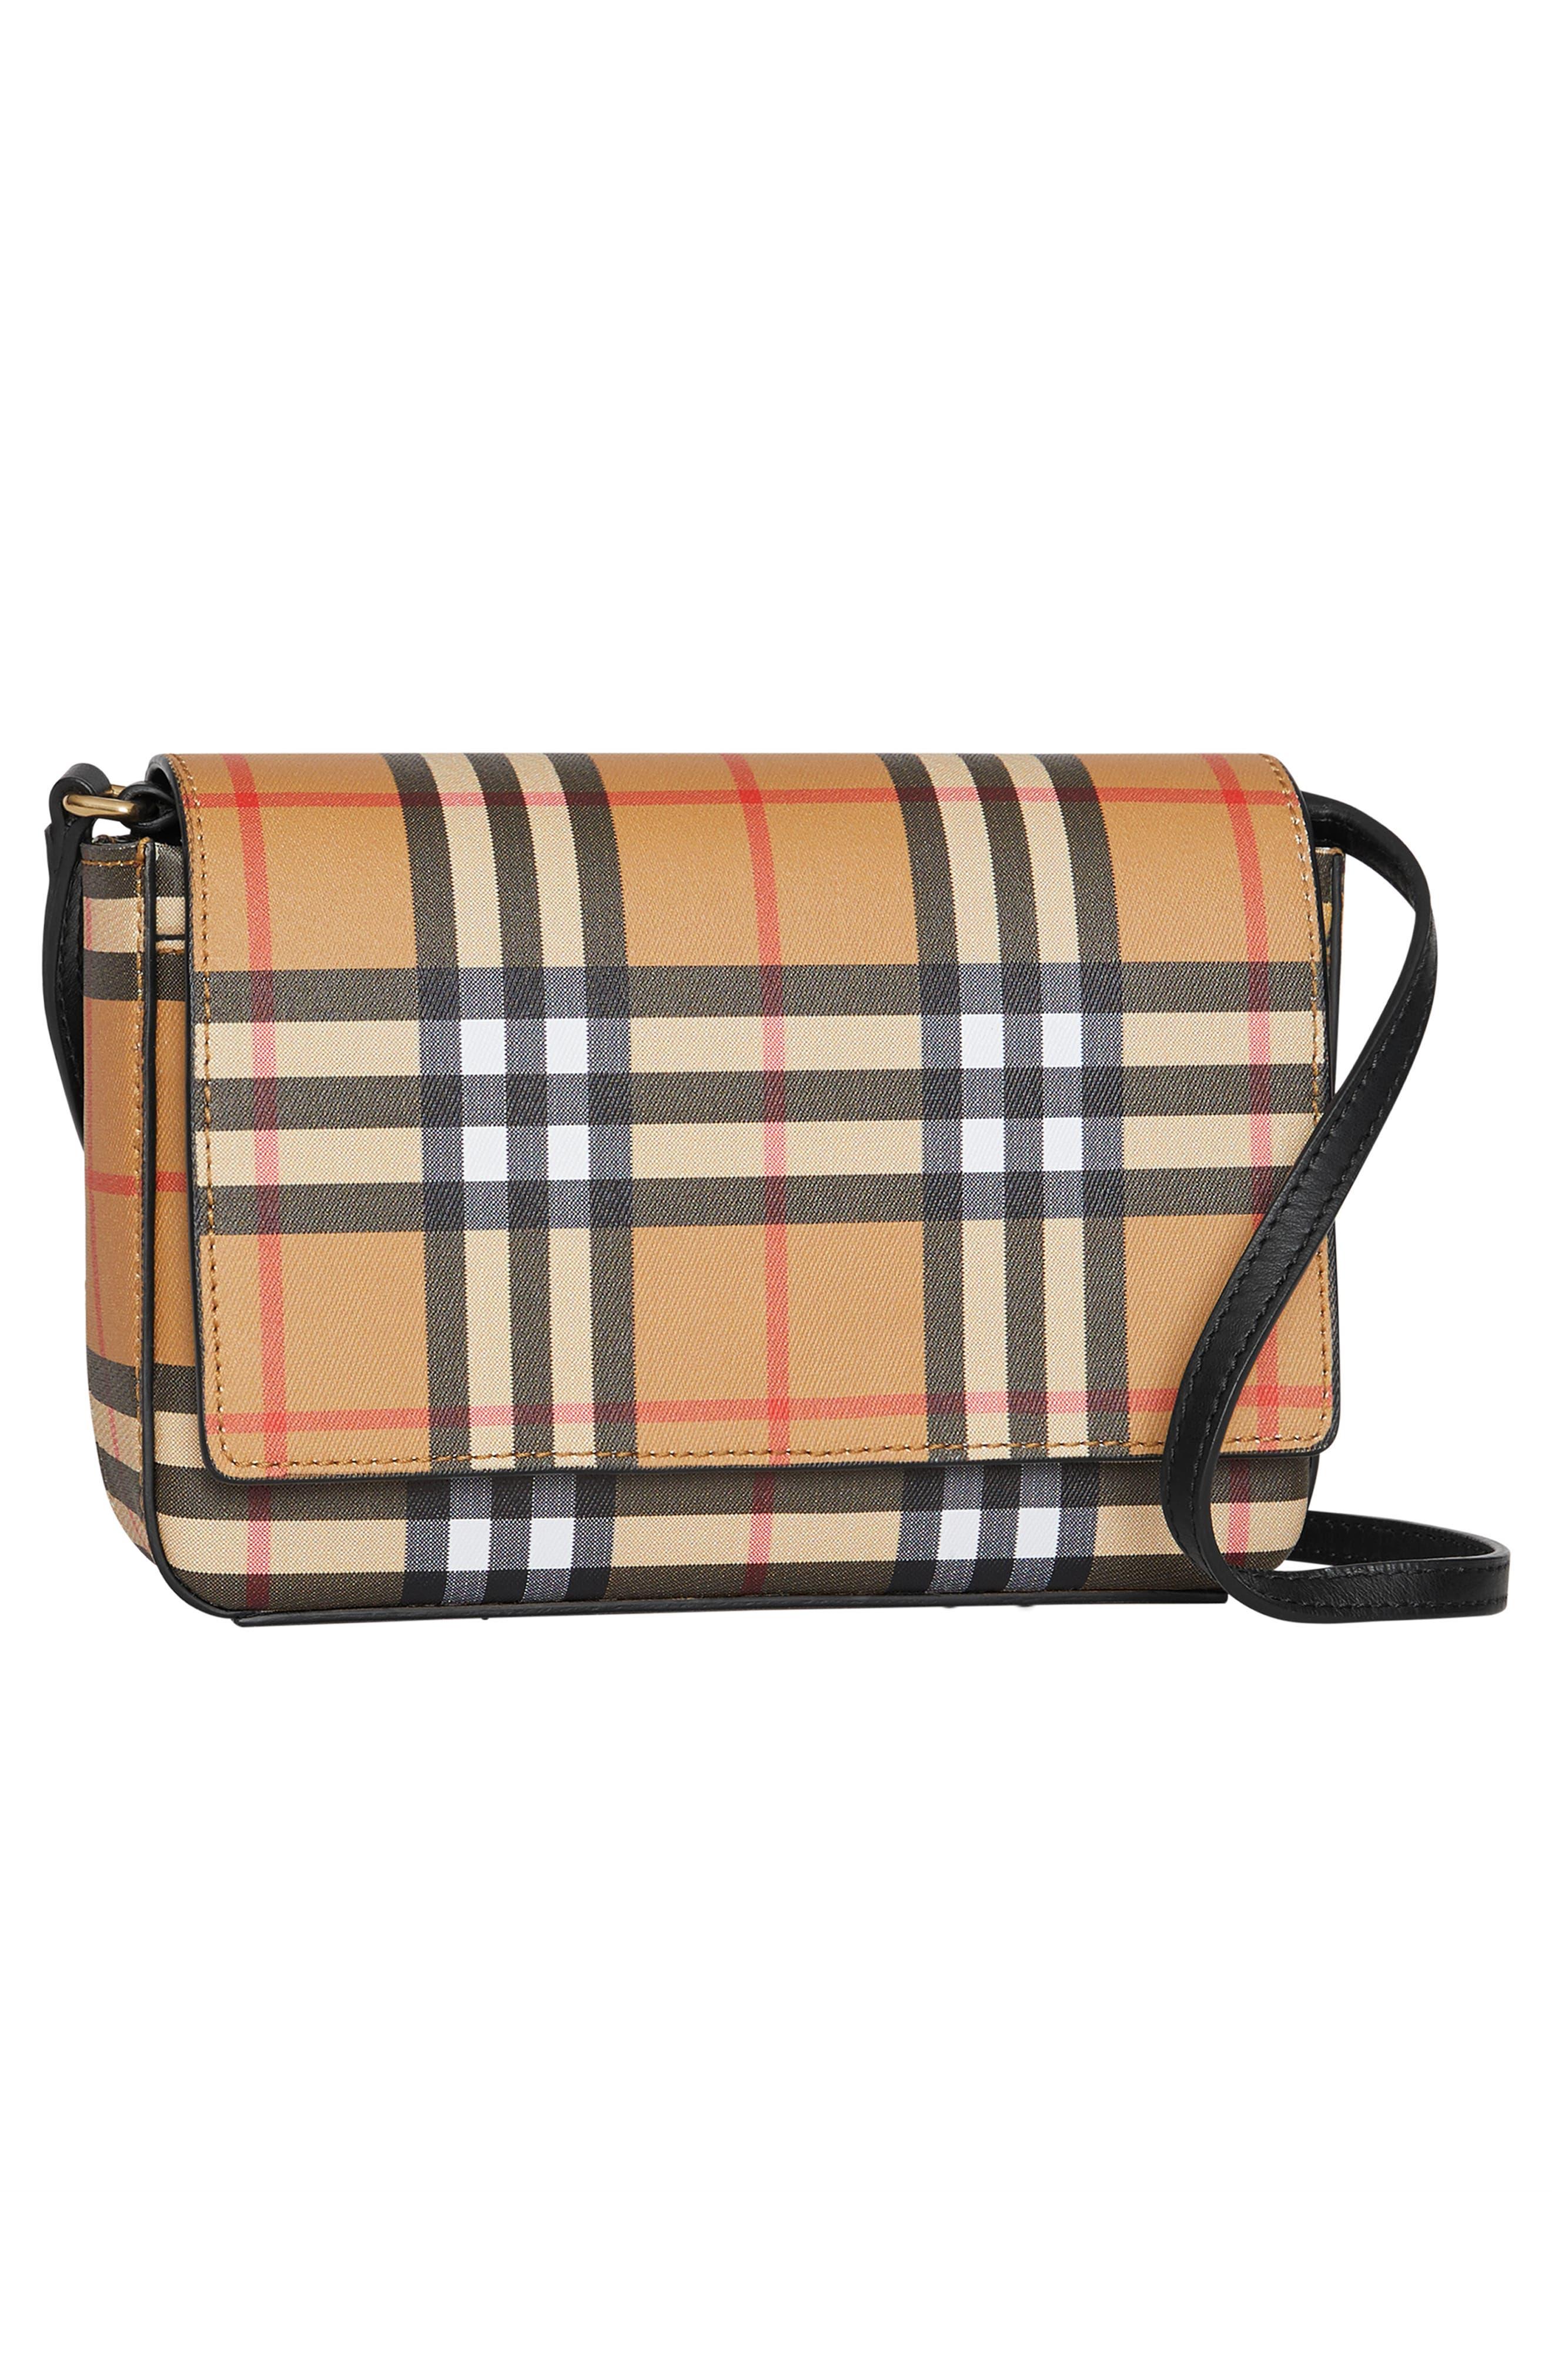 BURBERRY, Hampshire Vintage Check Crossbody Bag, Alternate thumbnail 7, color, BLACK